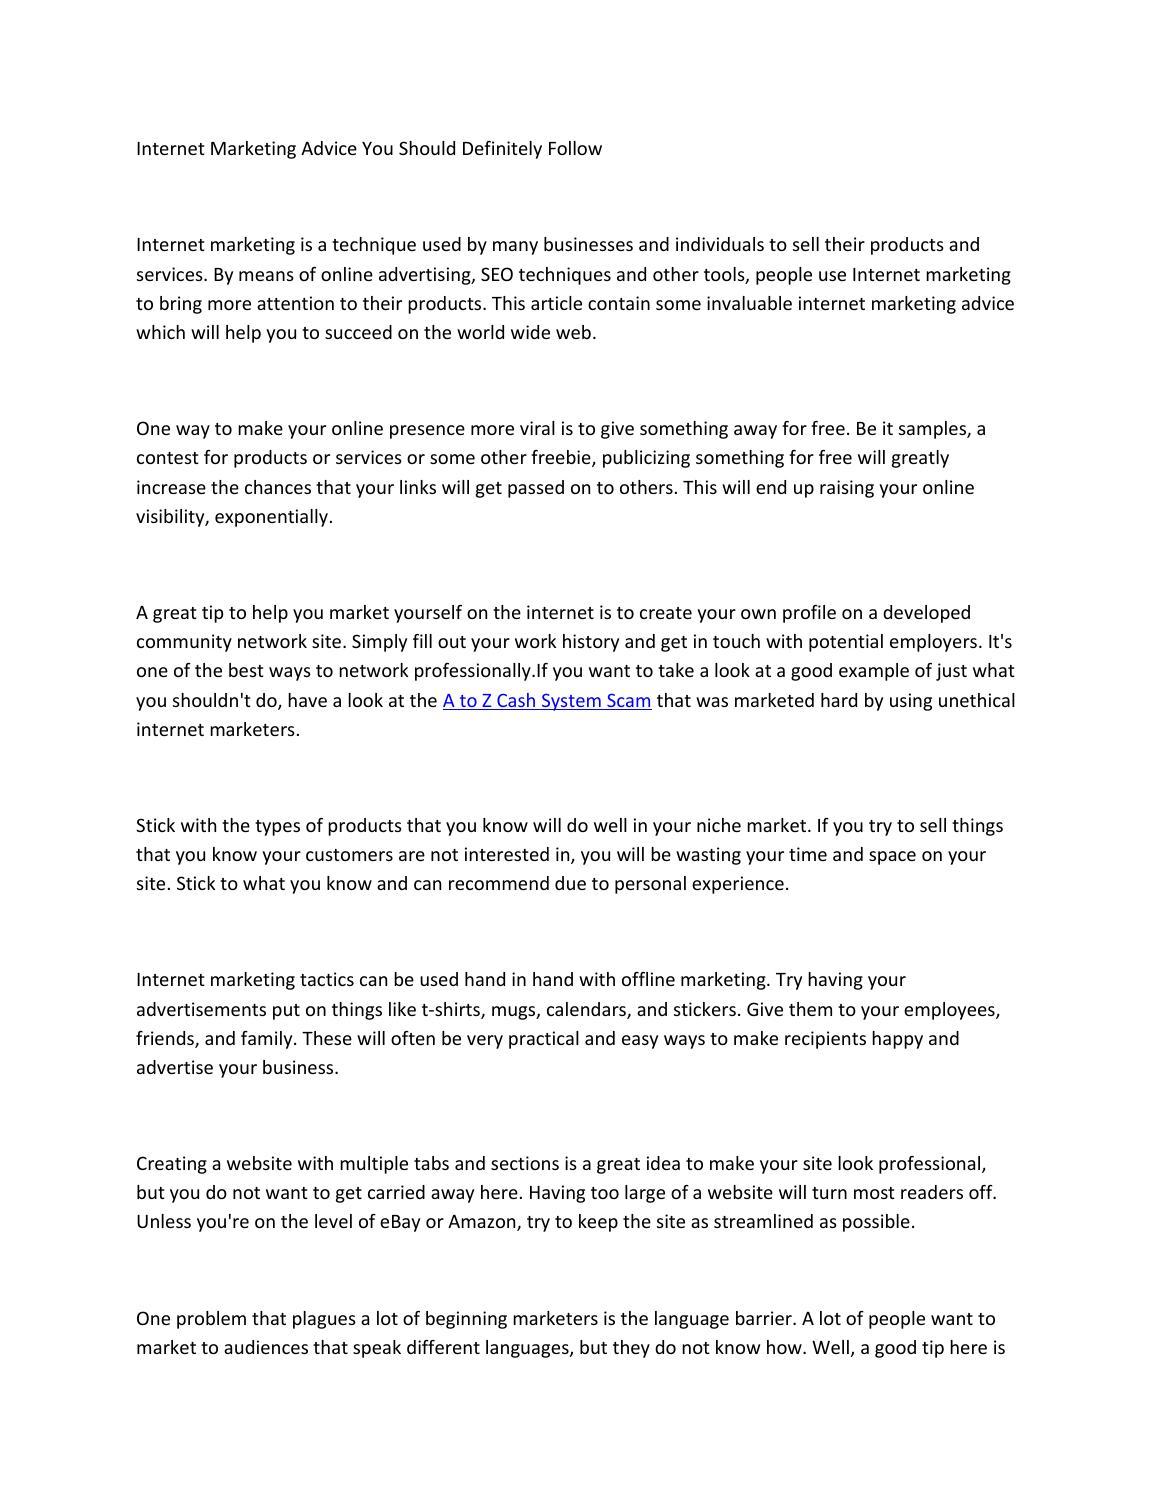 Internet marketing advice you should definitely follow pdf